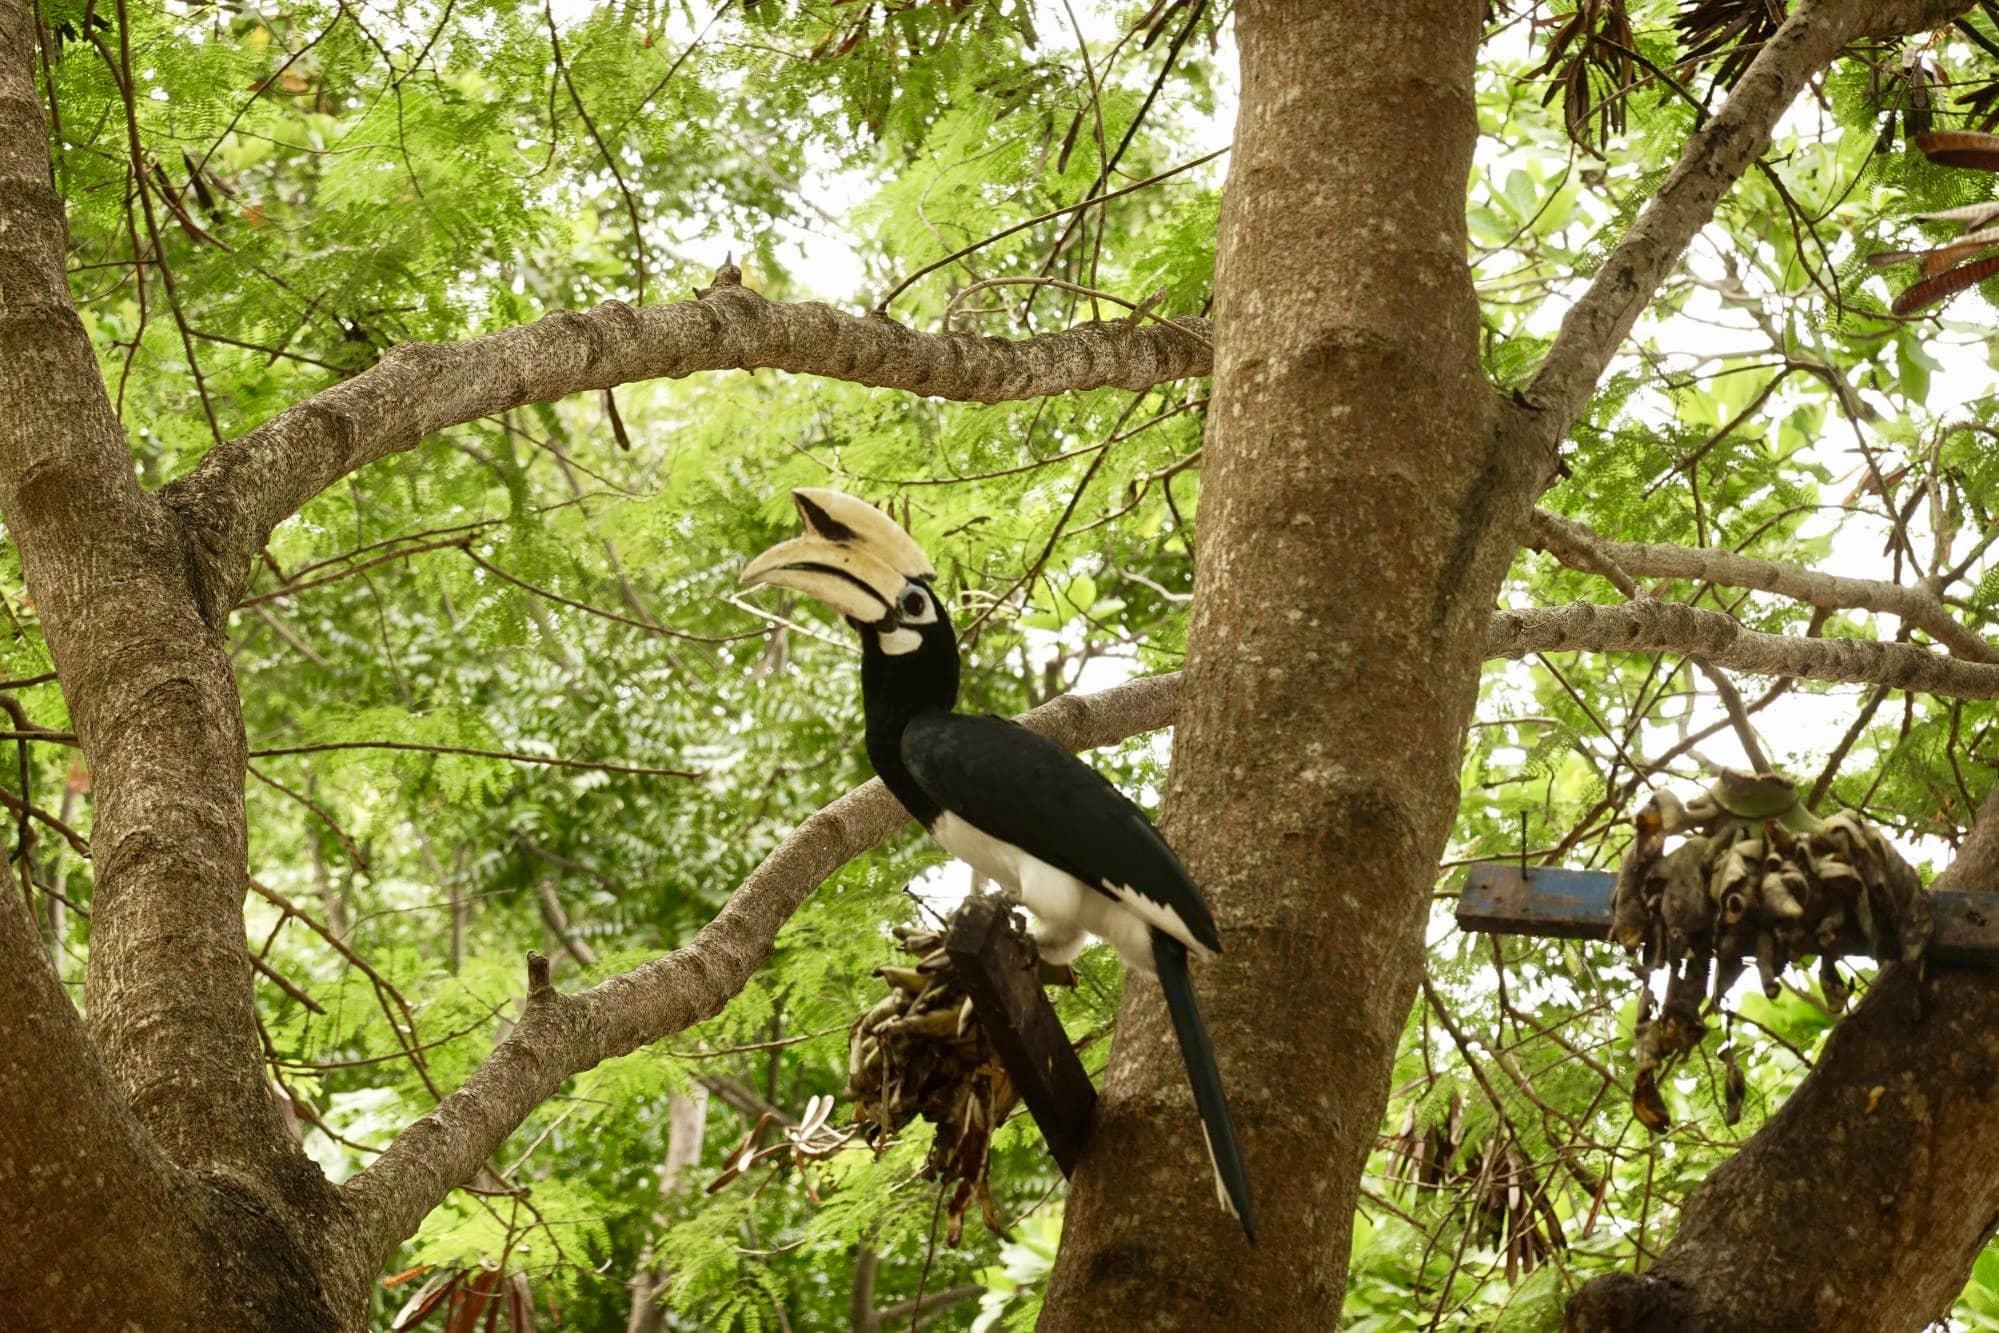 chim mỏ sừng tại phuket